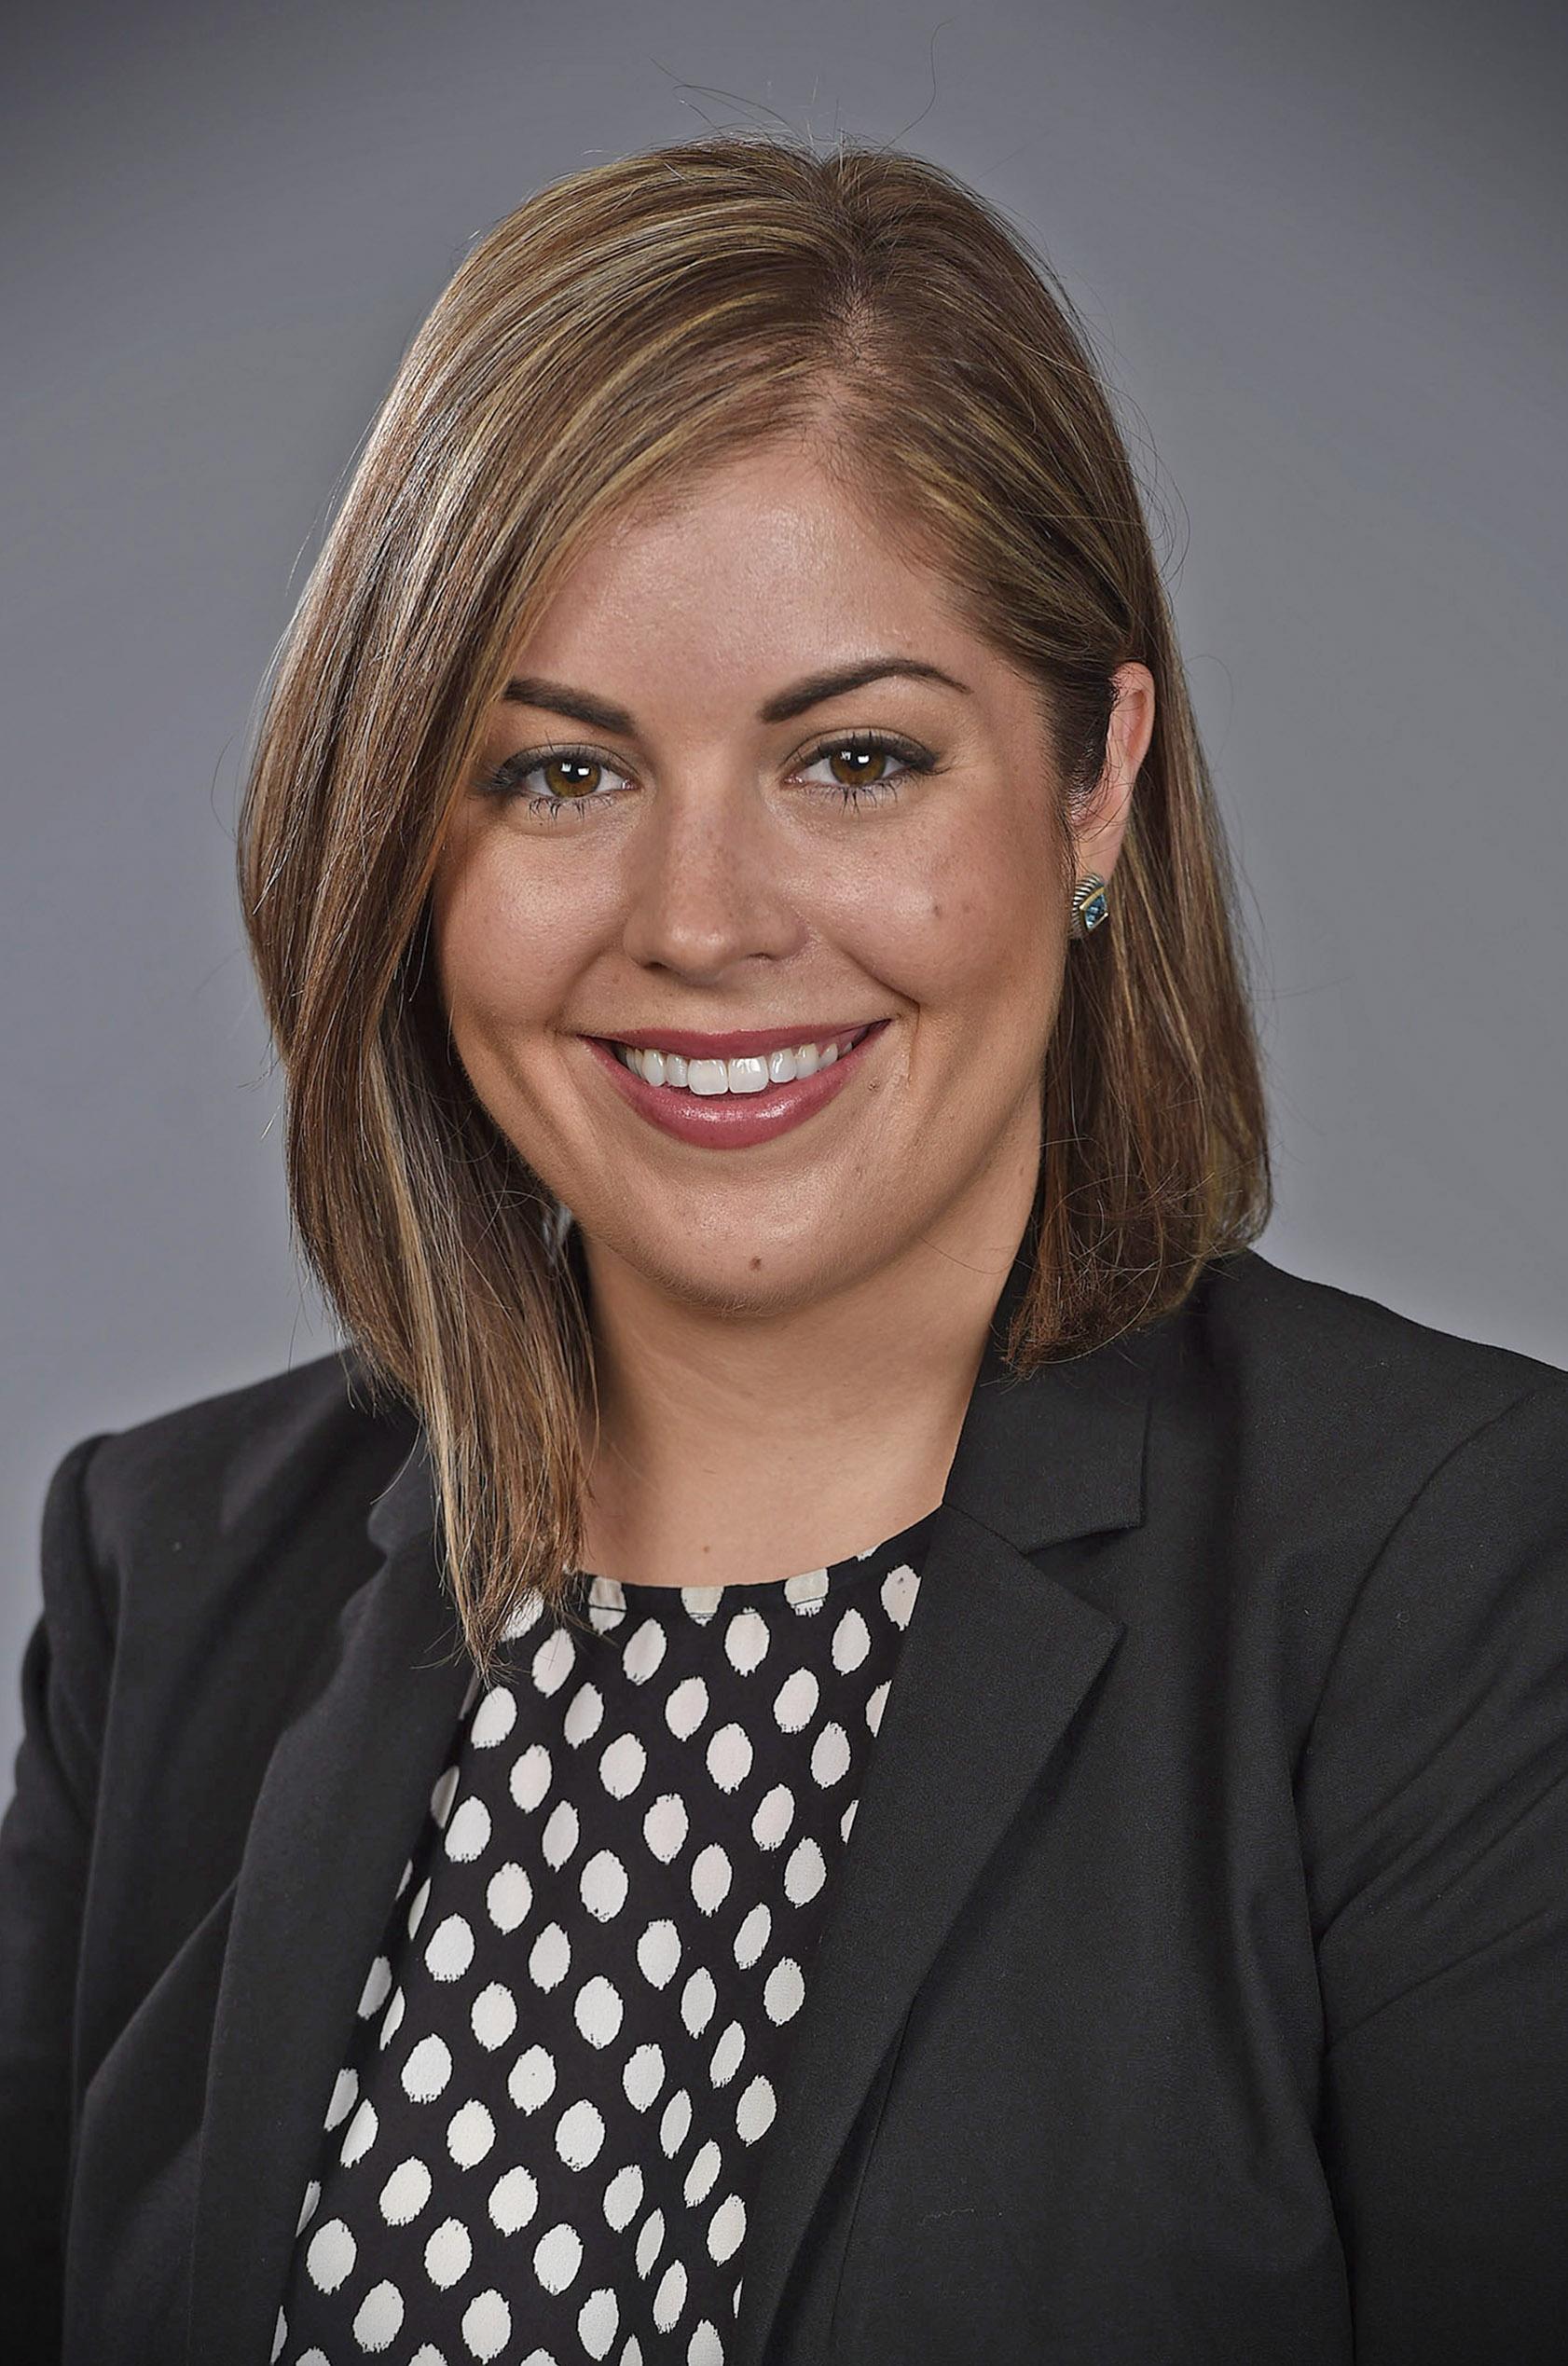 Danielle Permenter